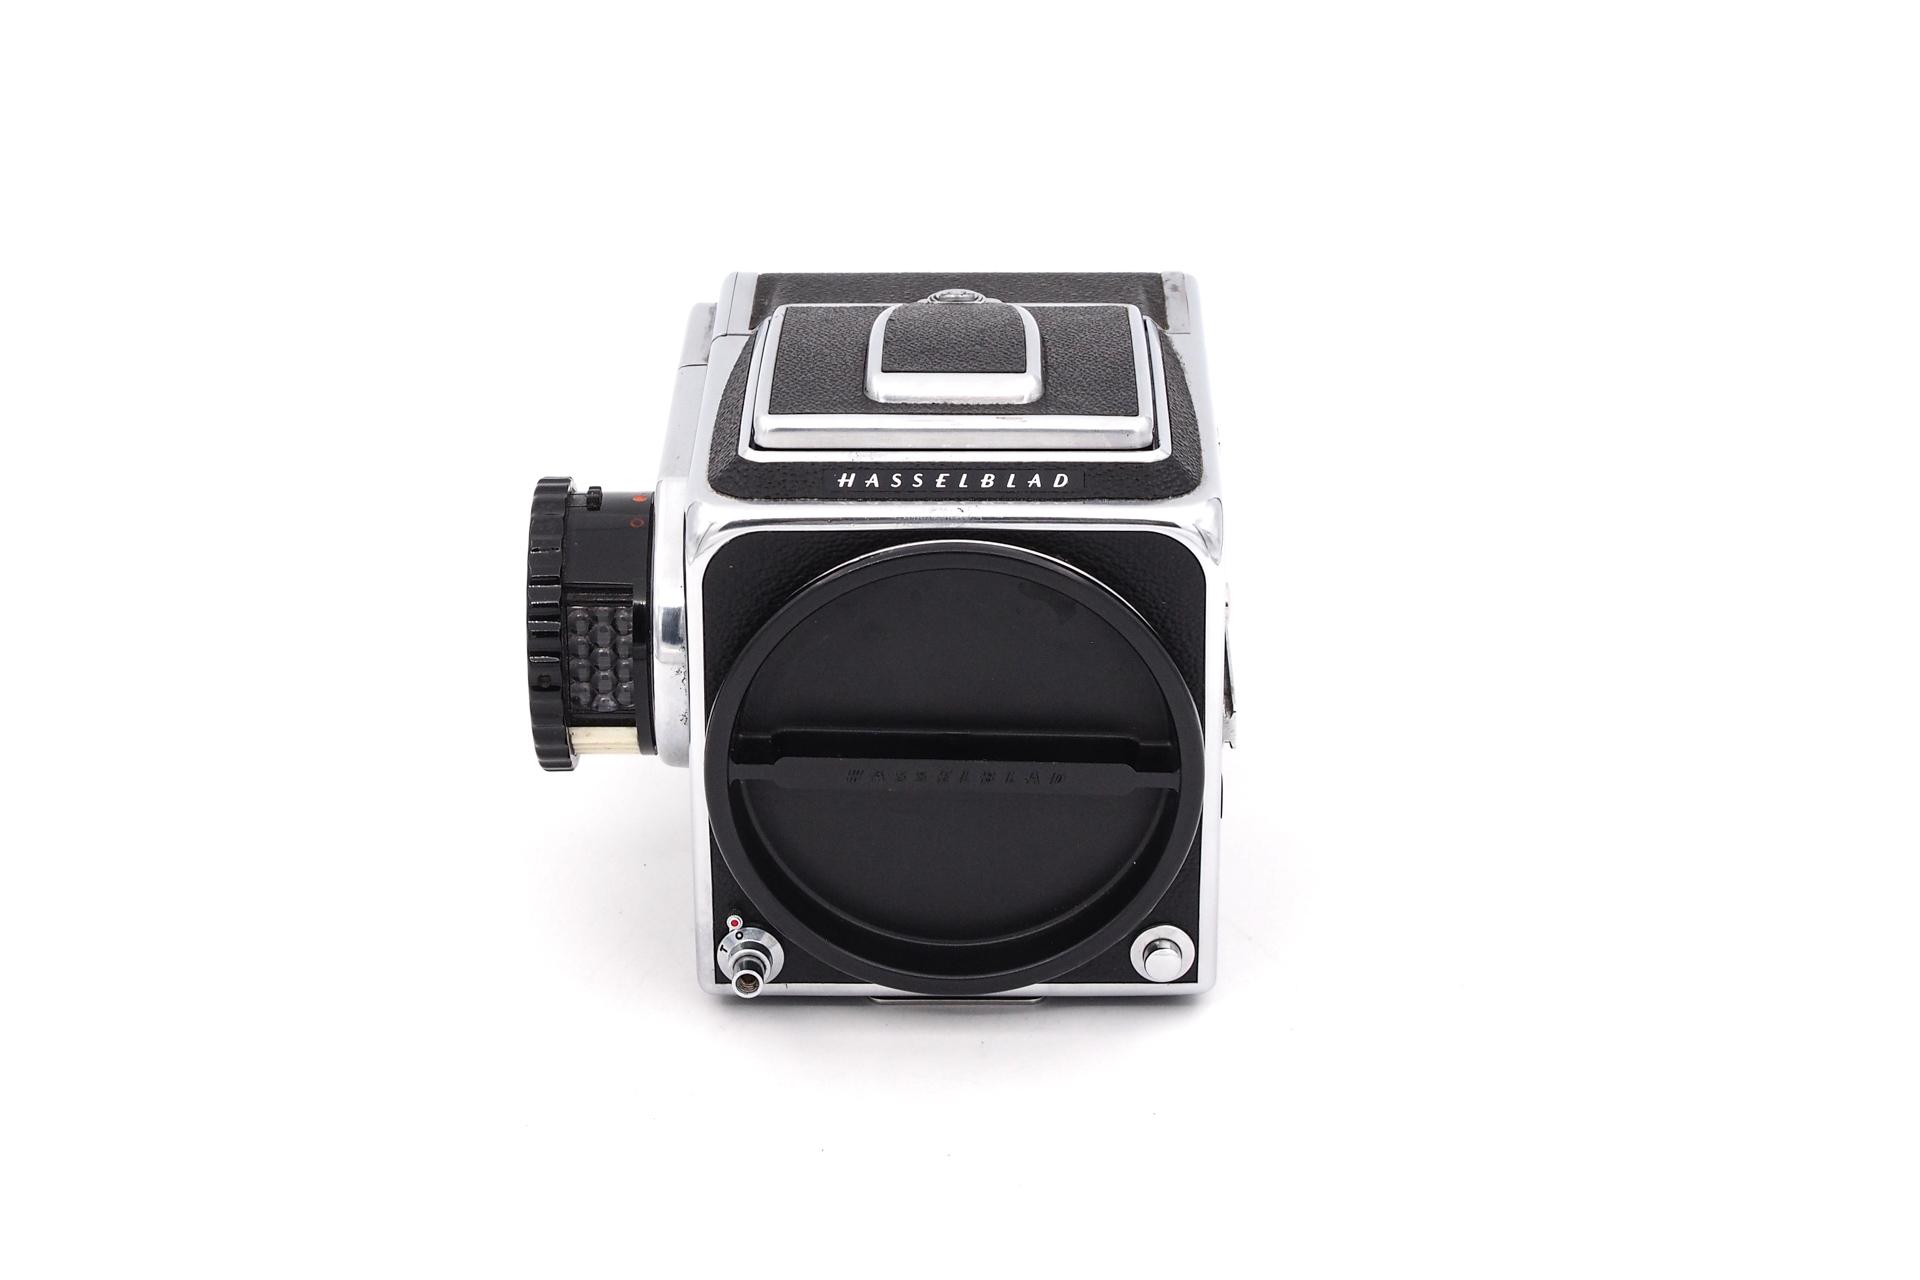 Hasselblad 500c/m + A12 Set